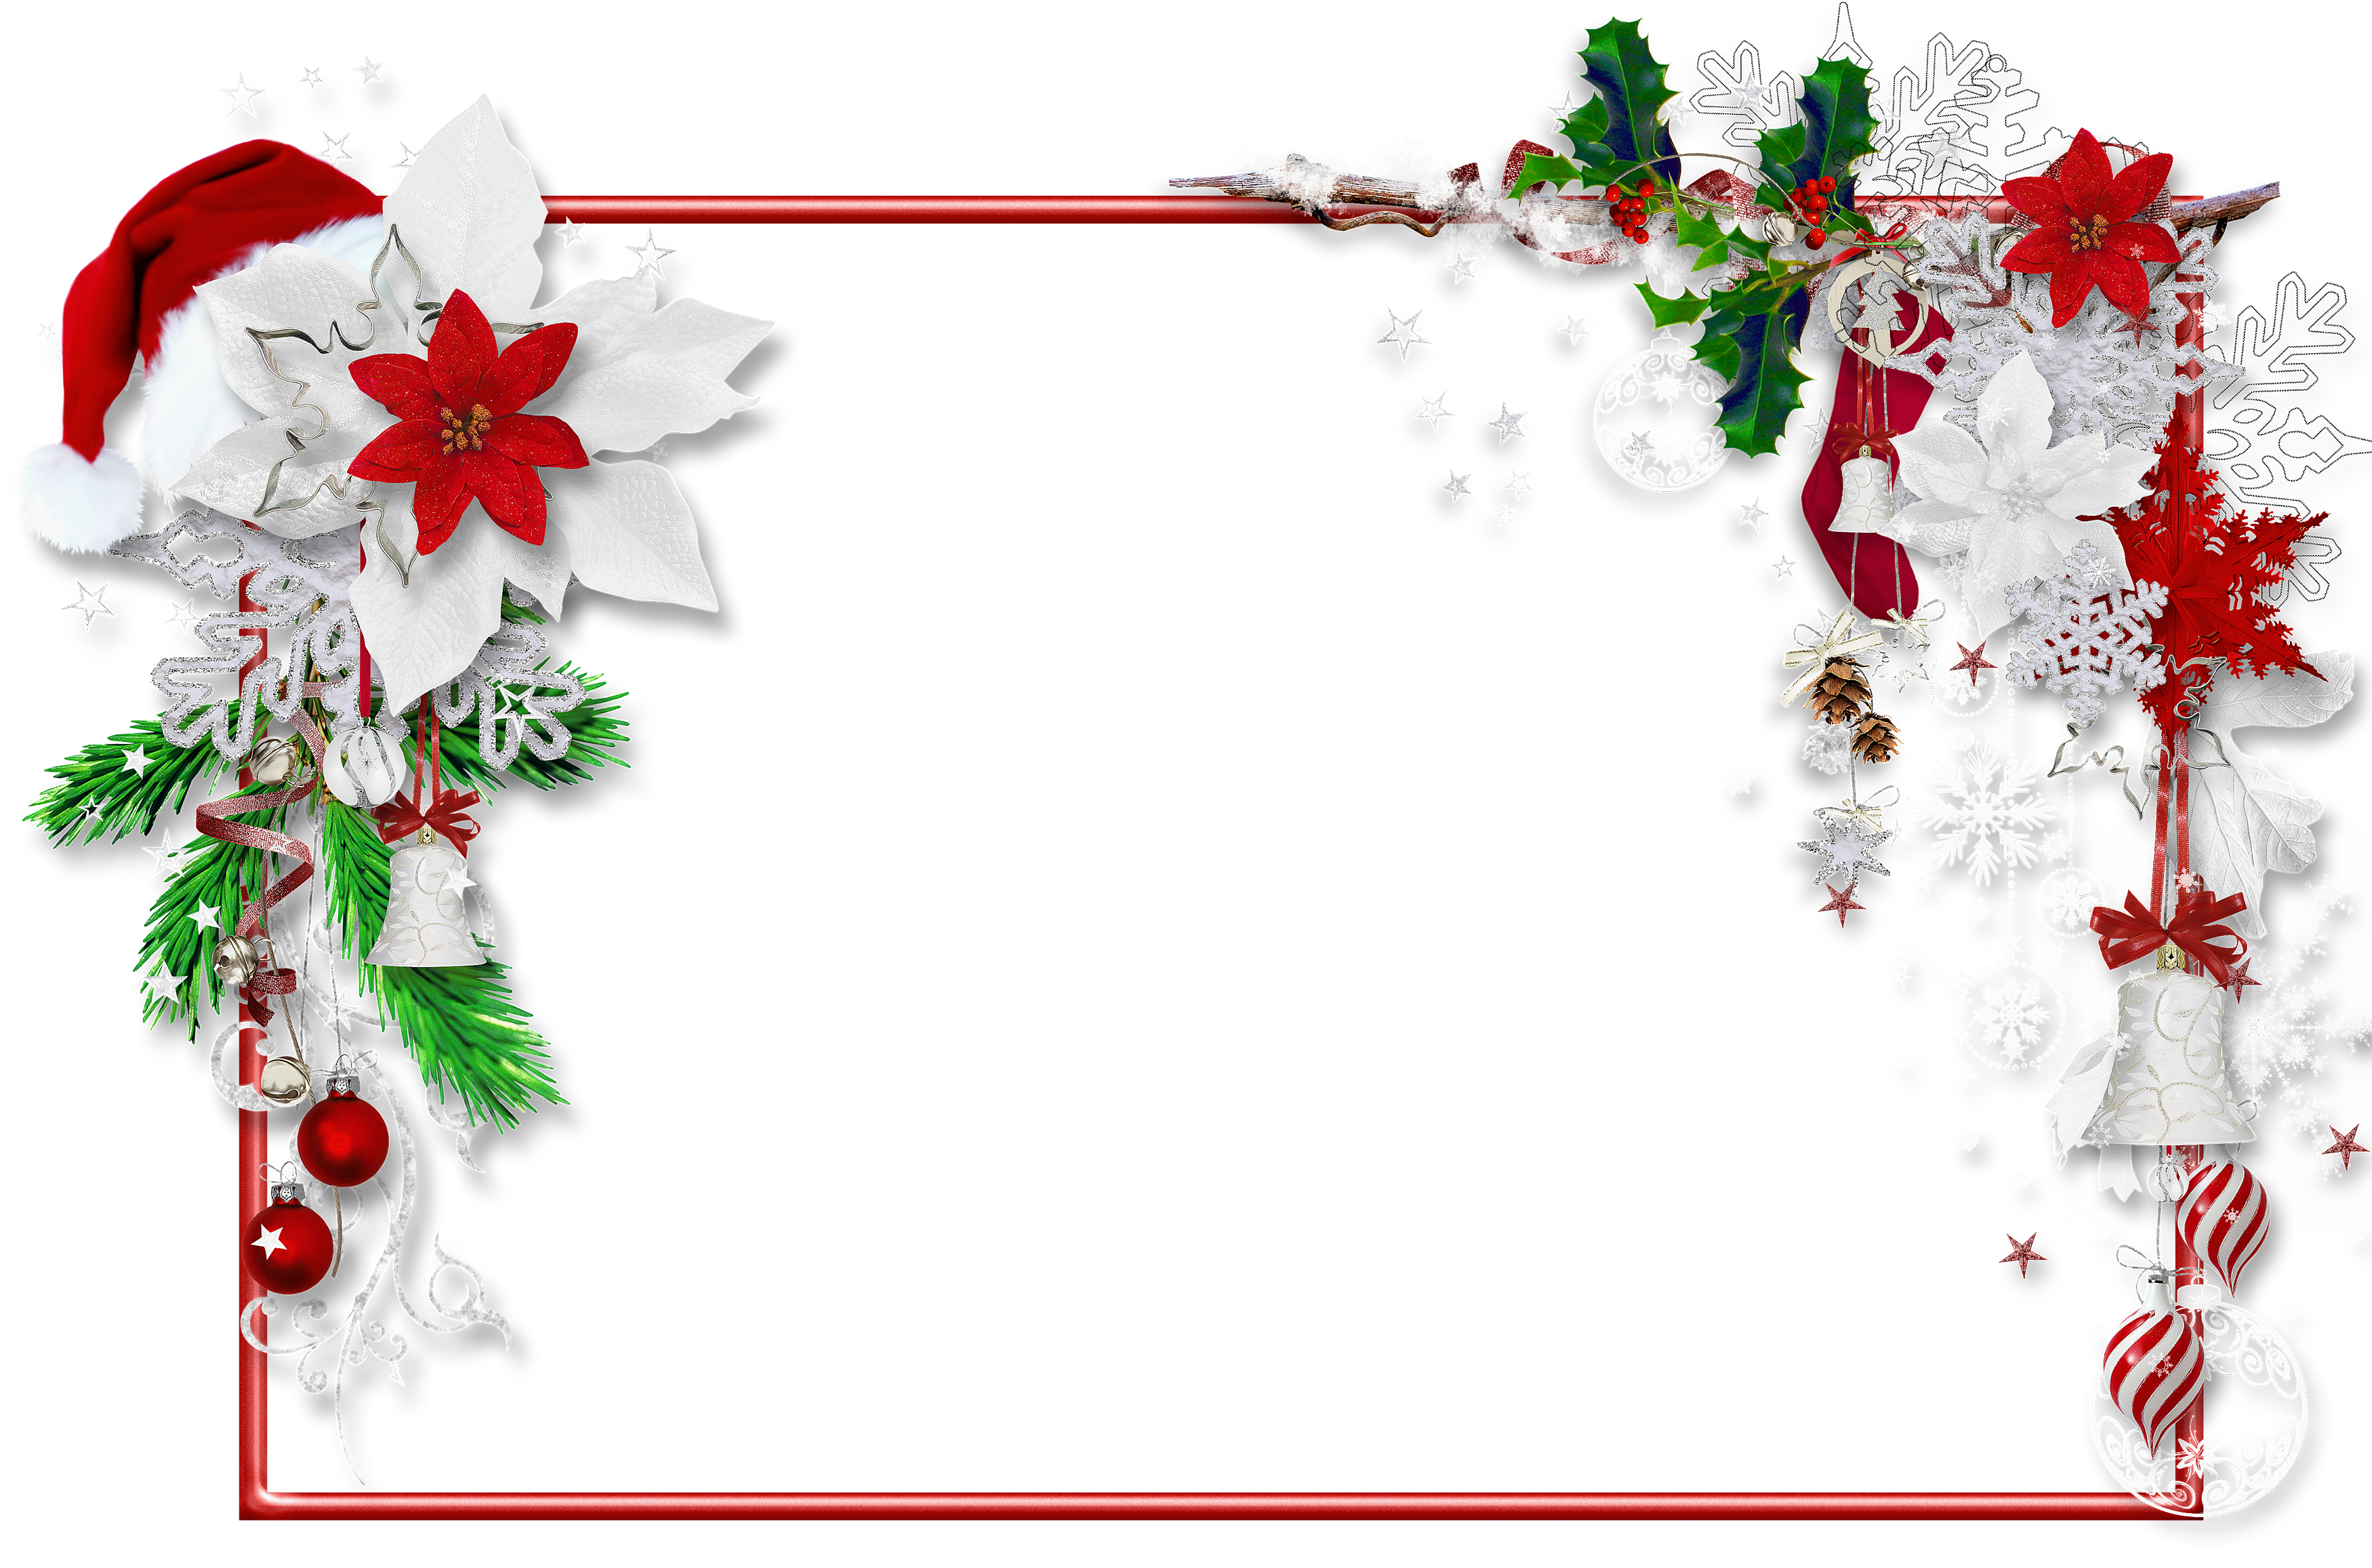 Xmas Frames Borders Arts | Christmas printables | Pinterest ...